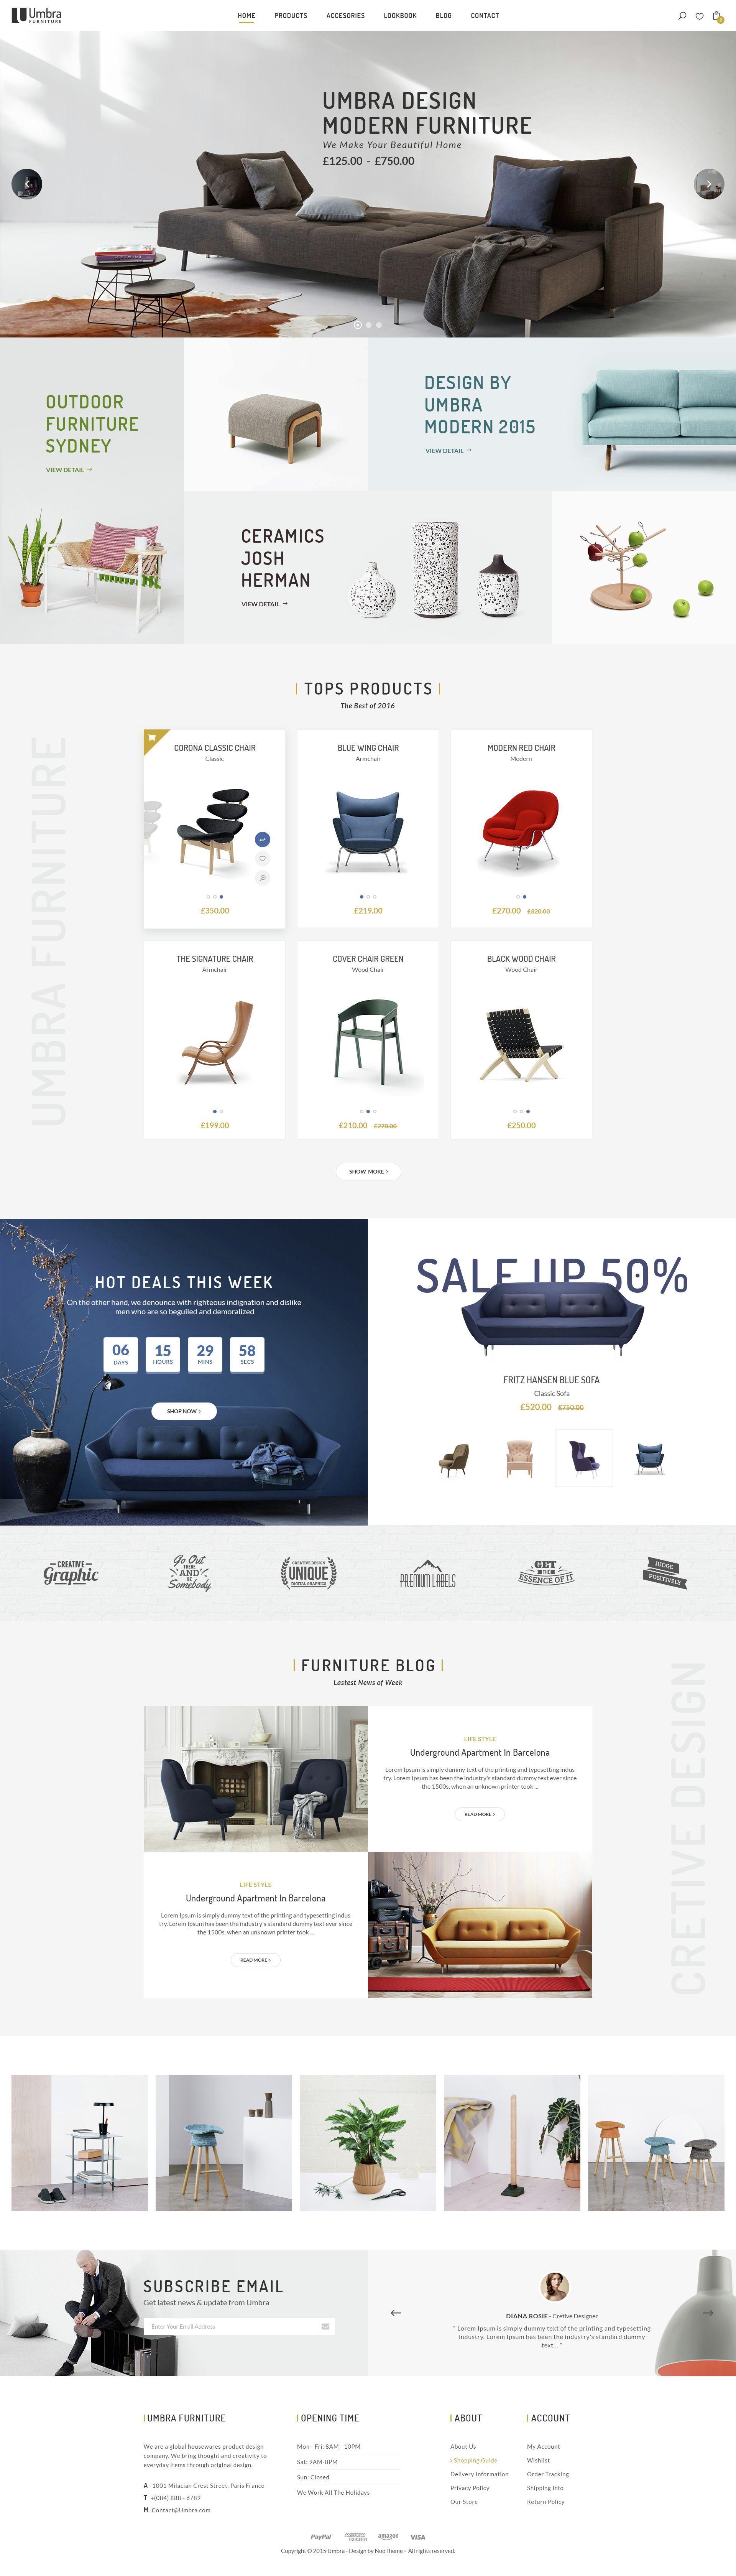 Umbra - Multi Concept eCommerce PSD Template   Apps, Catálogo y ...